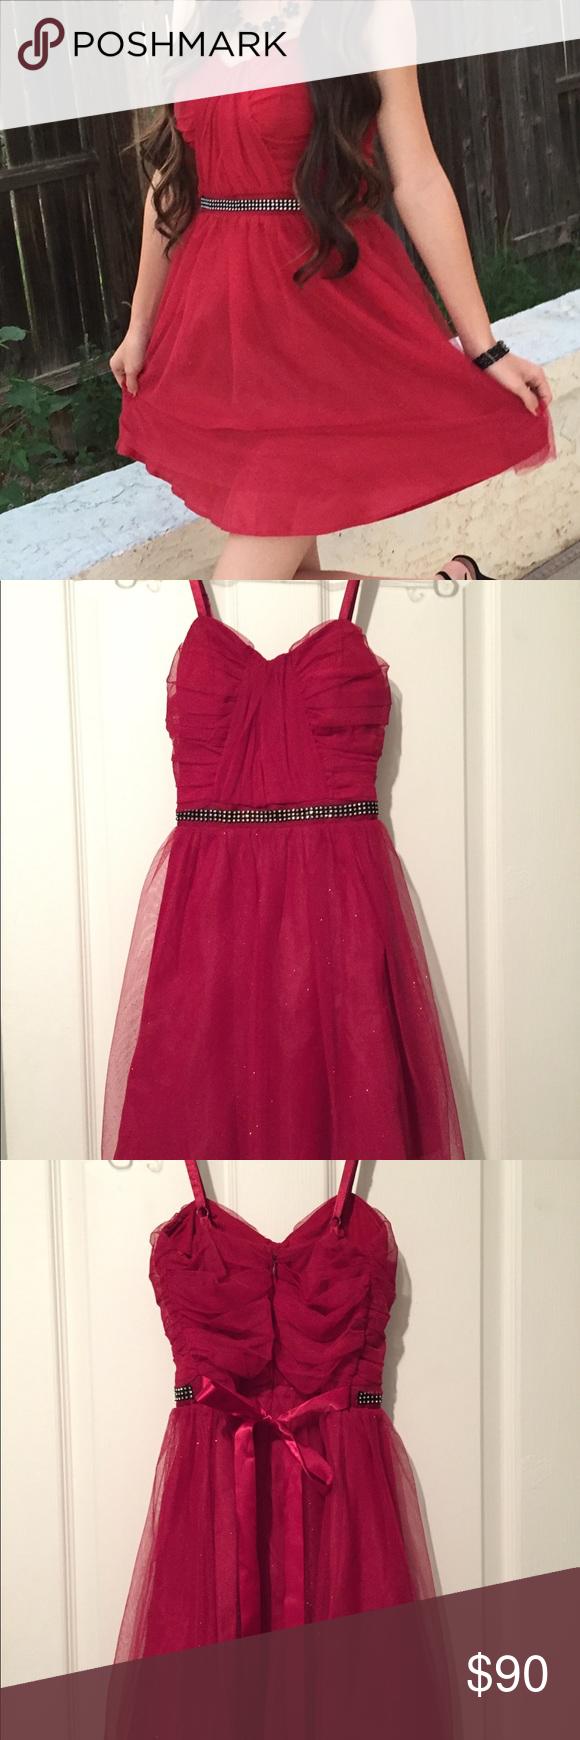 Bold red glitter party dress glitter party dress glitter party